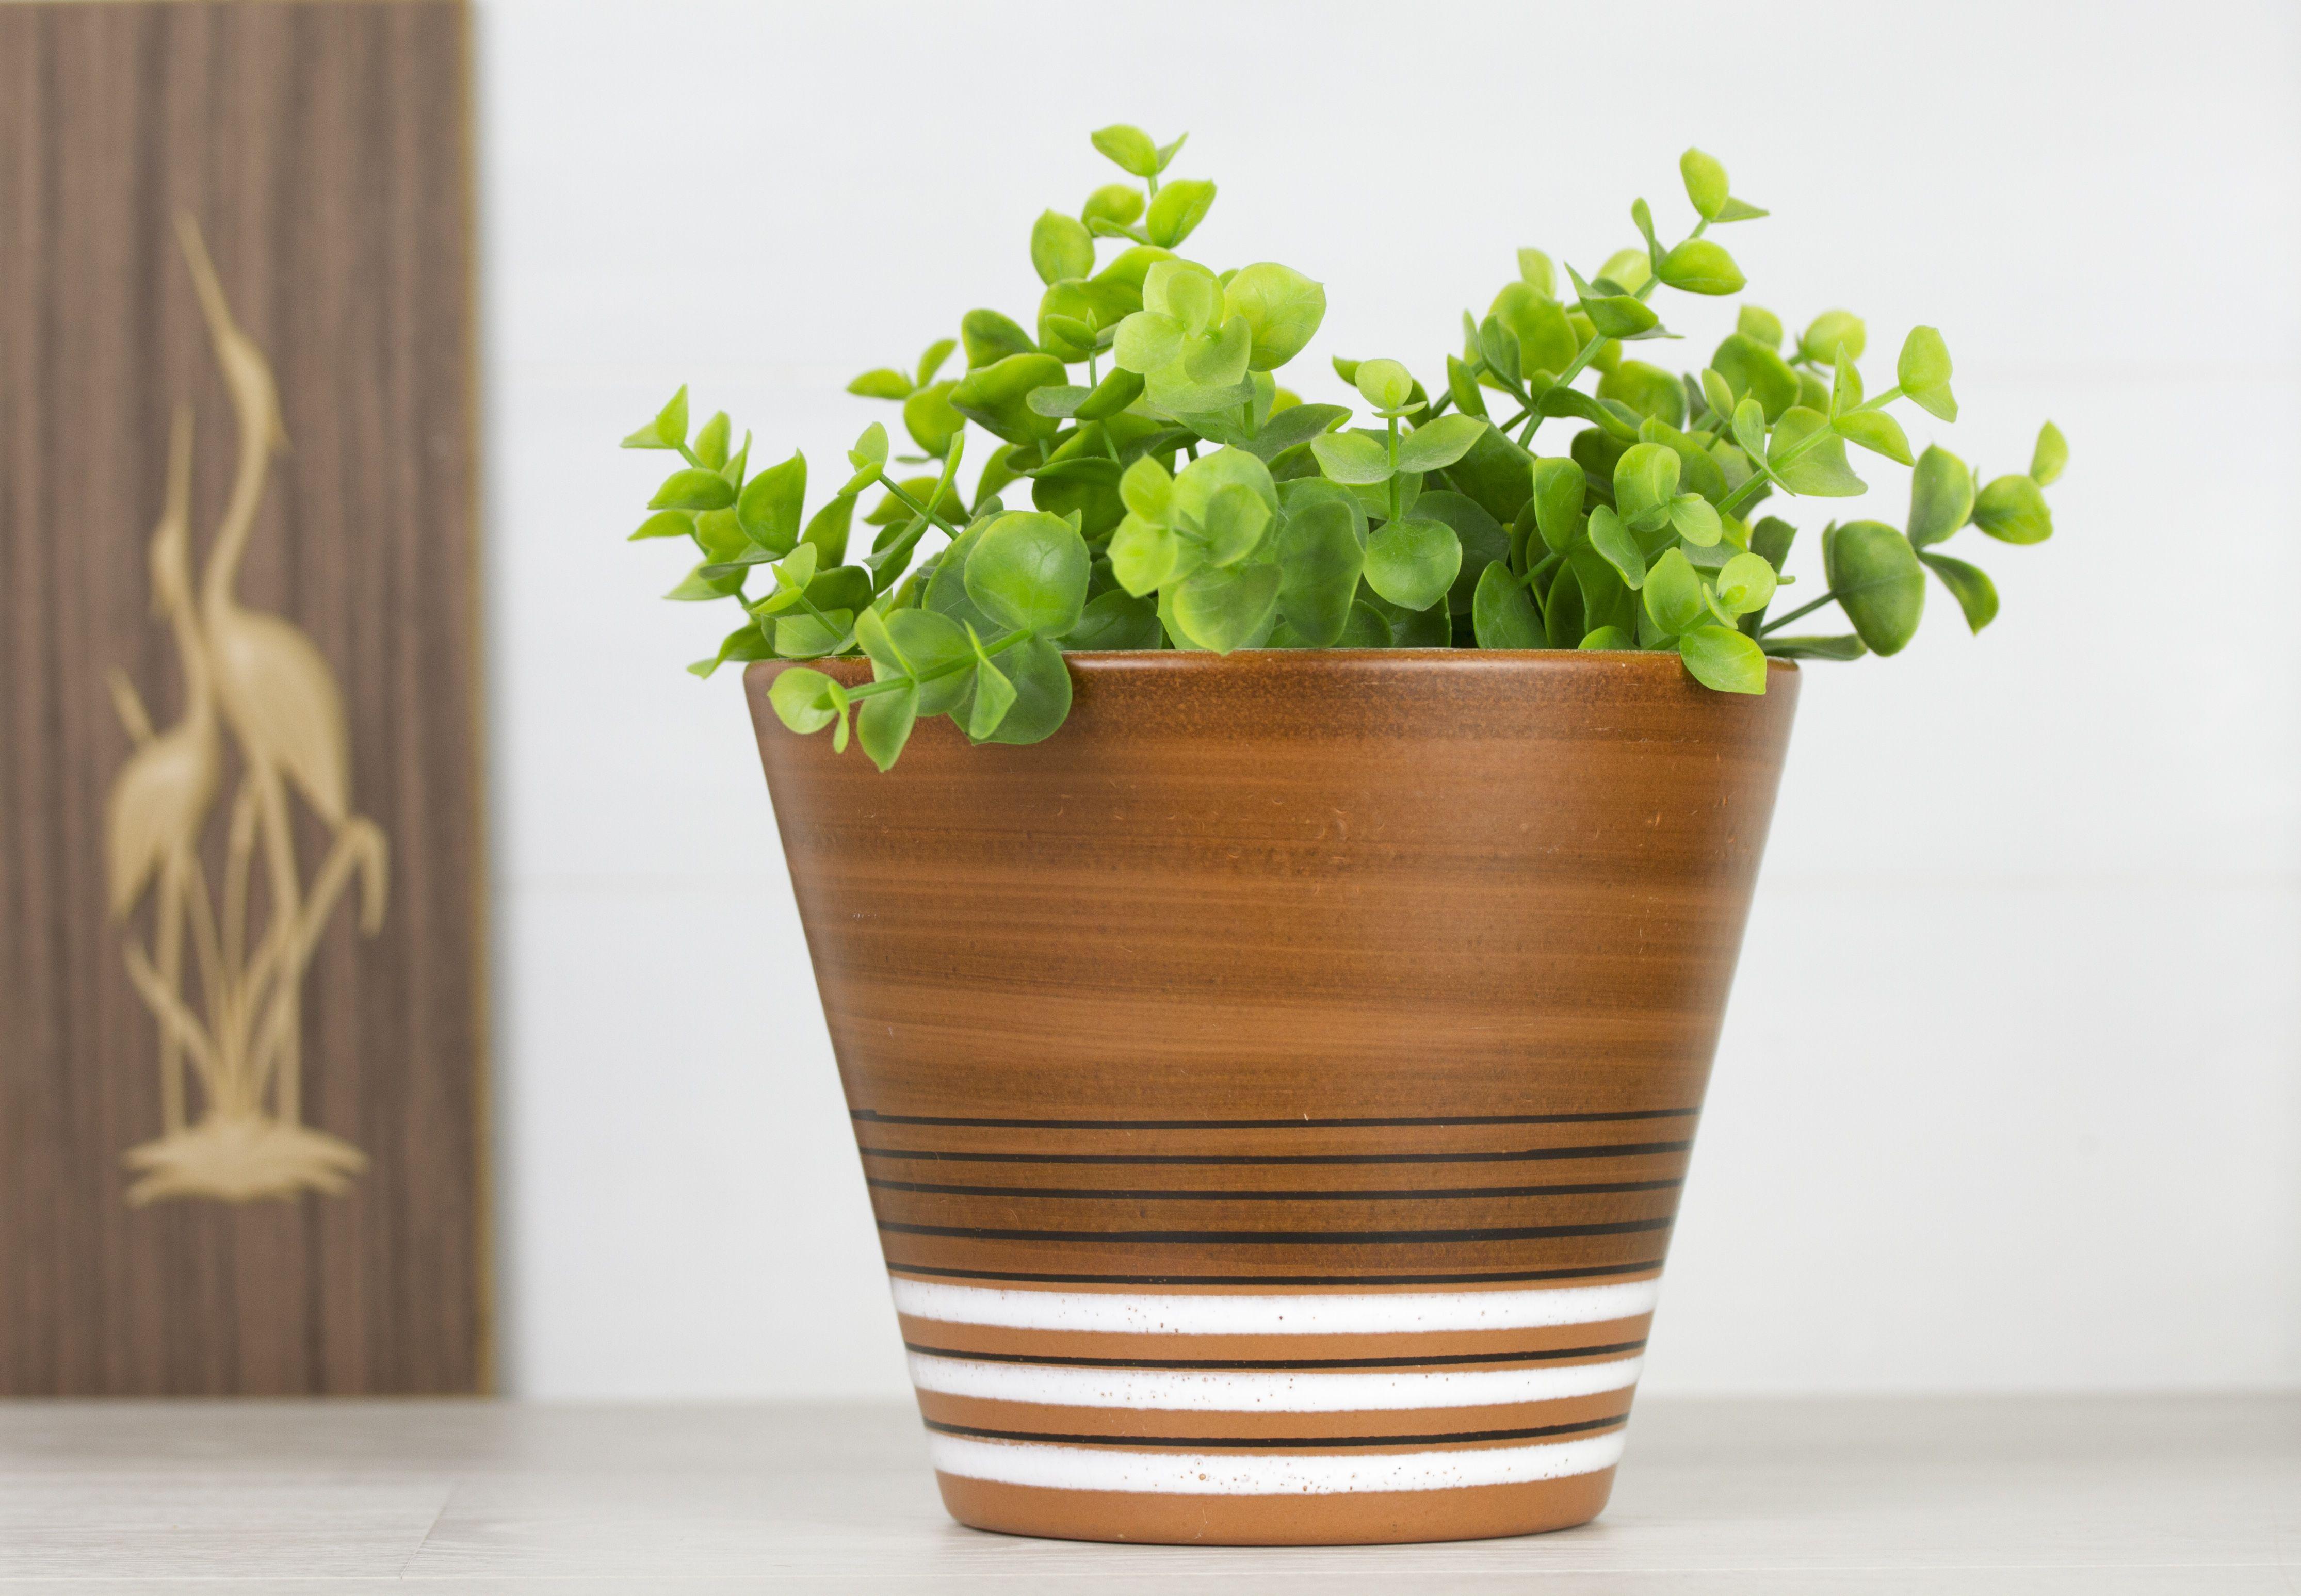 Tiko Gouda Planter Vintage Dutch Ceramic Planters Flower Pots